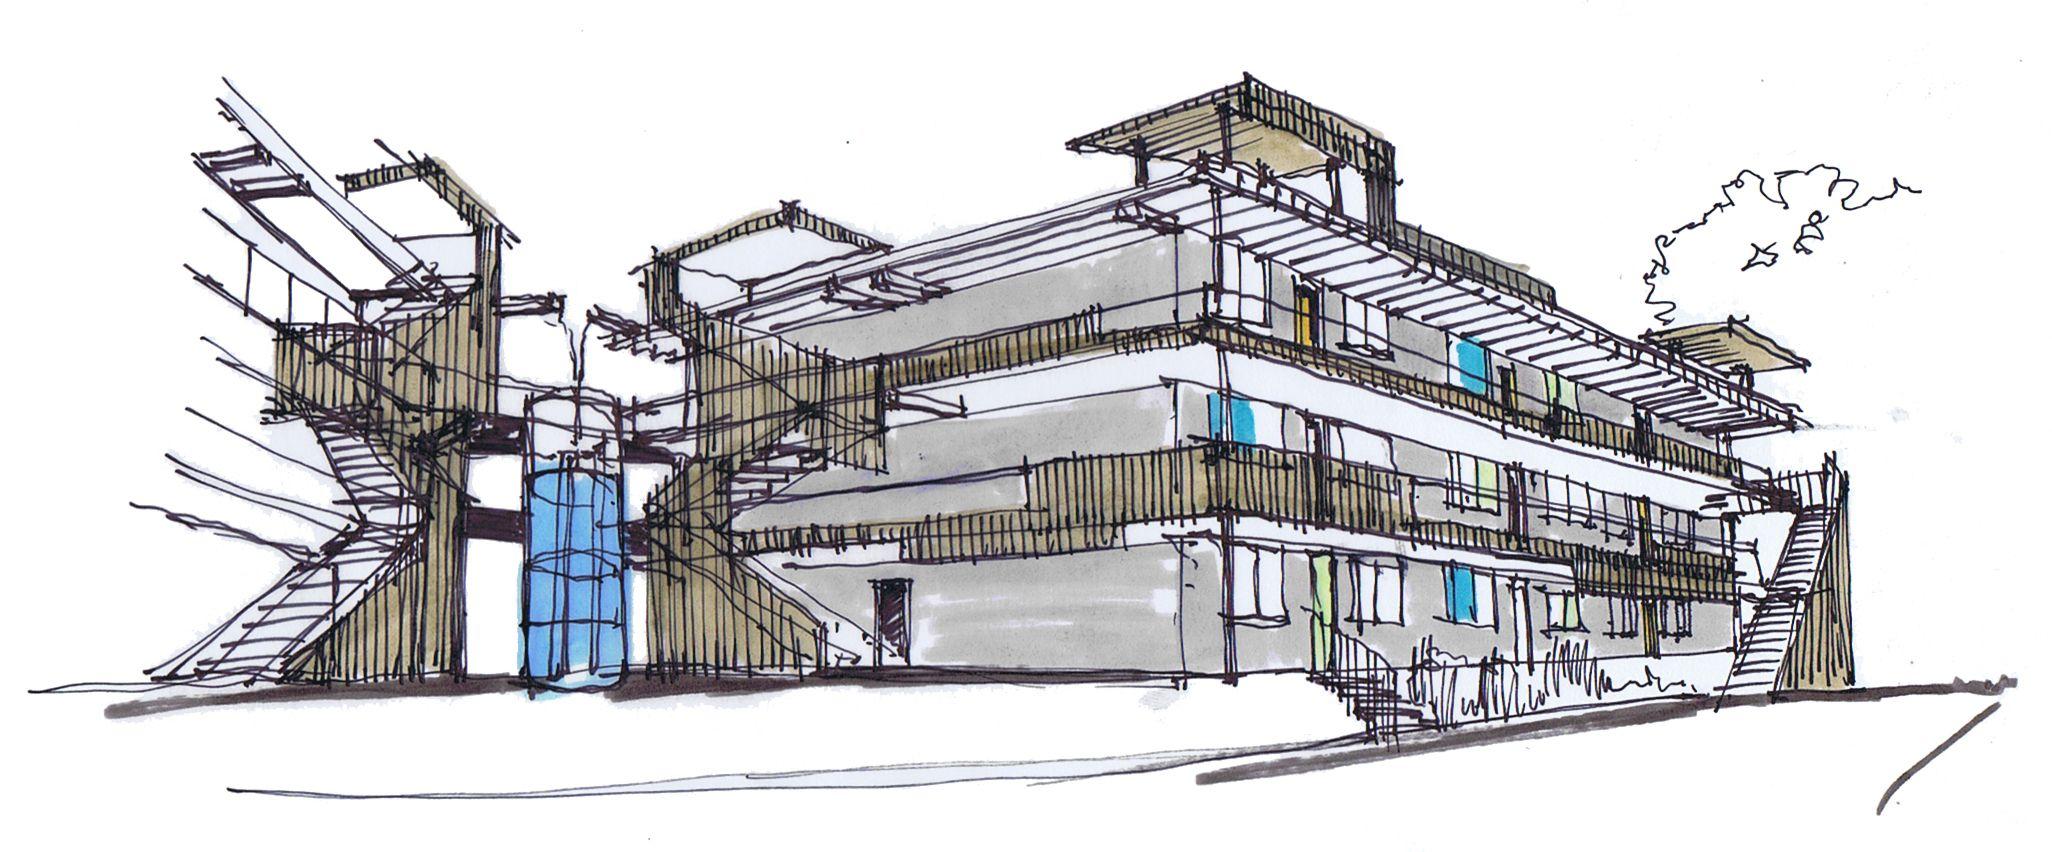 Ecosketchjpg  Eskiz Sketch Croquis - Modern building sketches